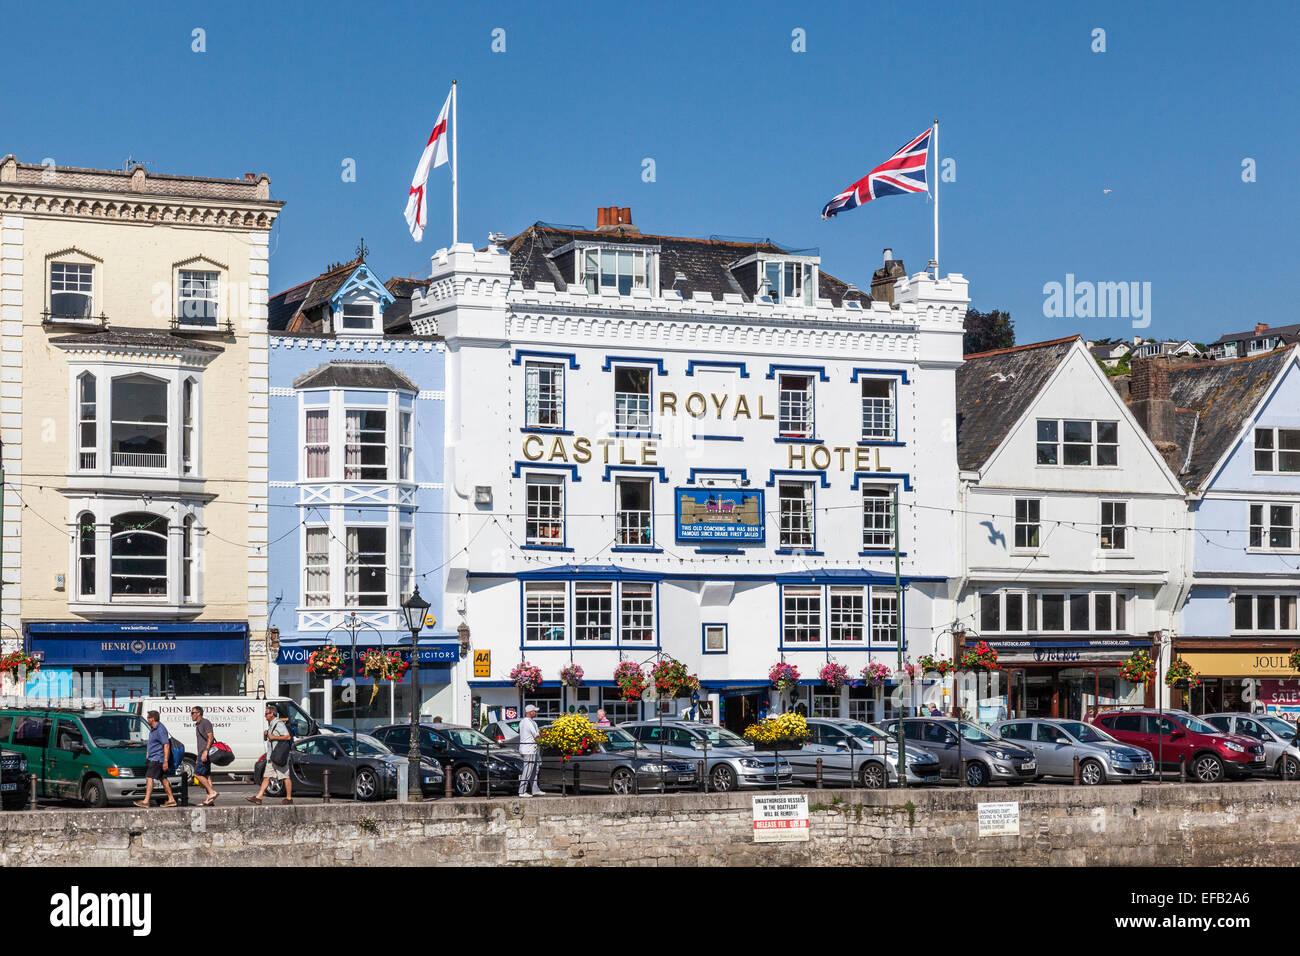 Royal Castle Hotel in Dartmouth South Devon, UK Stock Photo